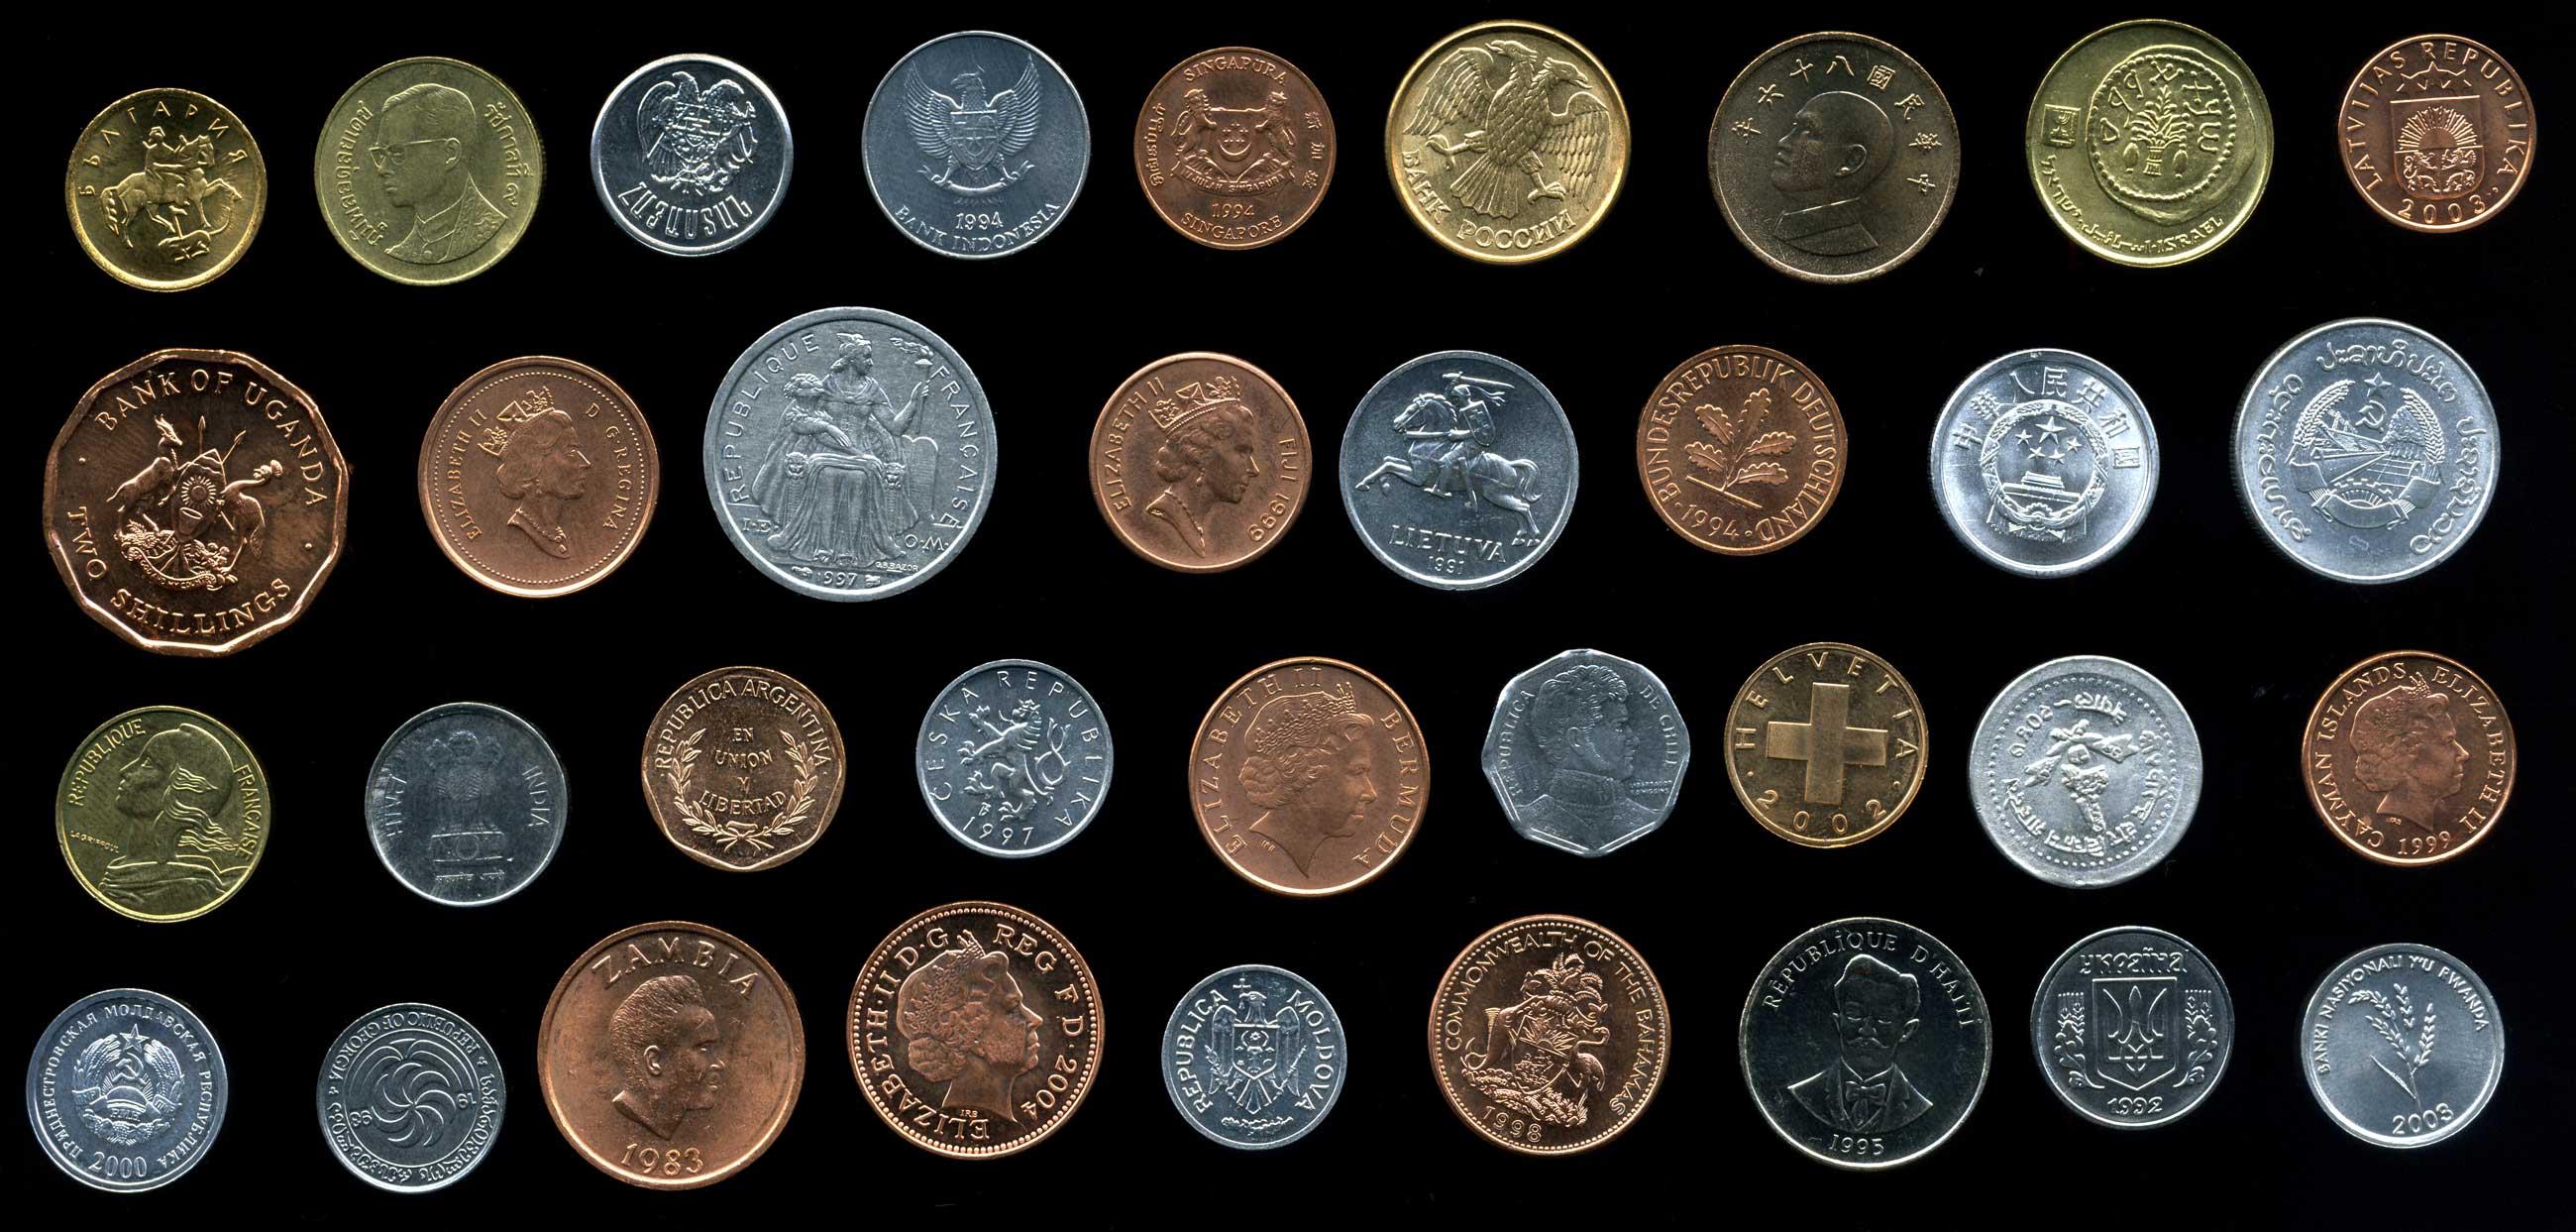 него подозрение деньги стран мира в фото с названиями две